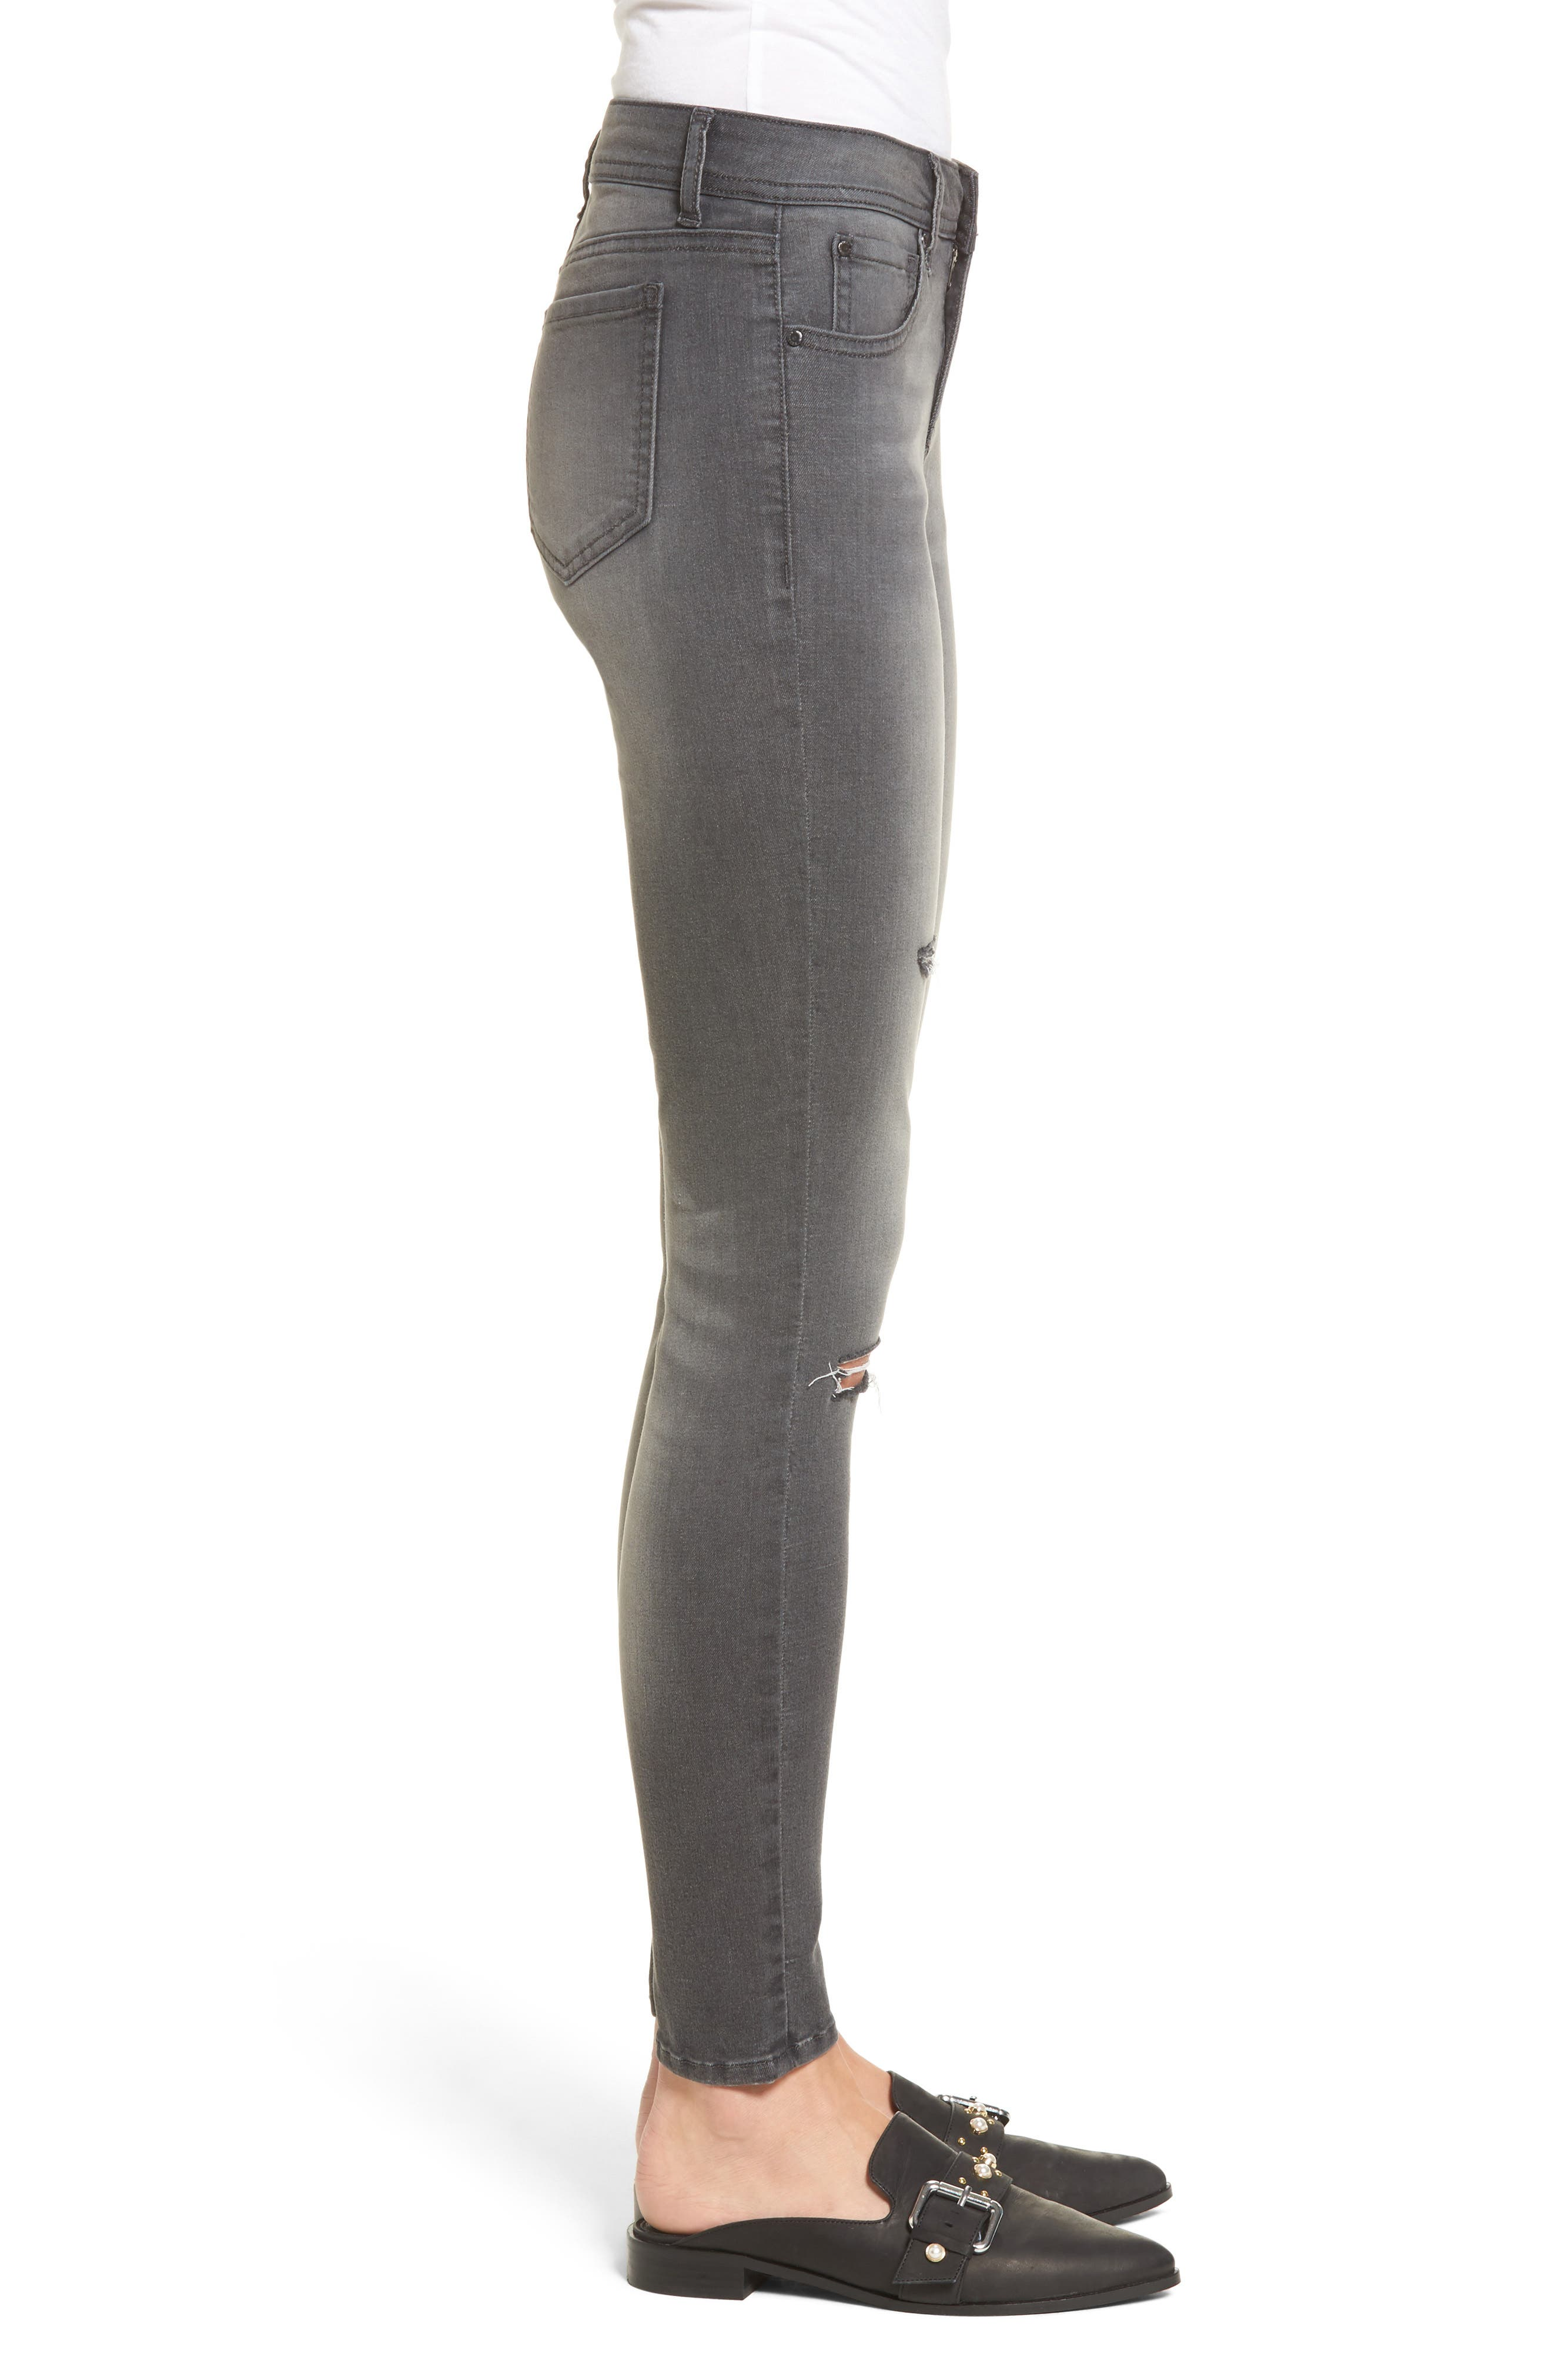 Ripped Skinny Jeans,                             Alternate thumbnail 3, color,                             Rebelite Charcoal